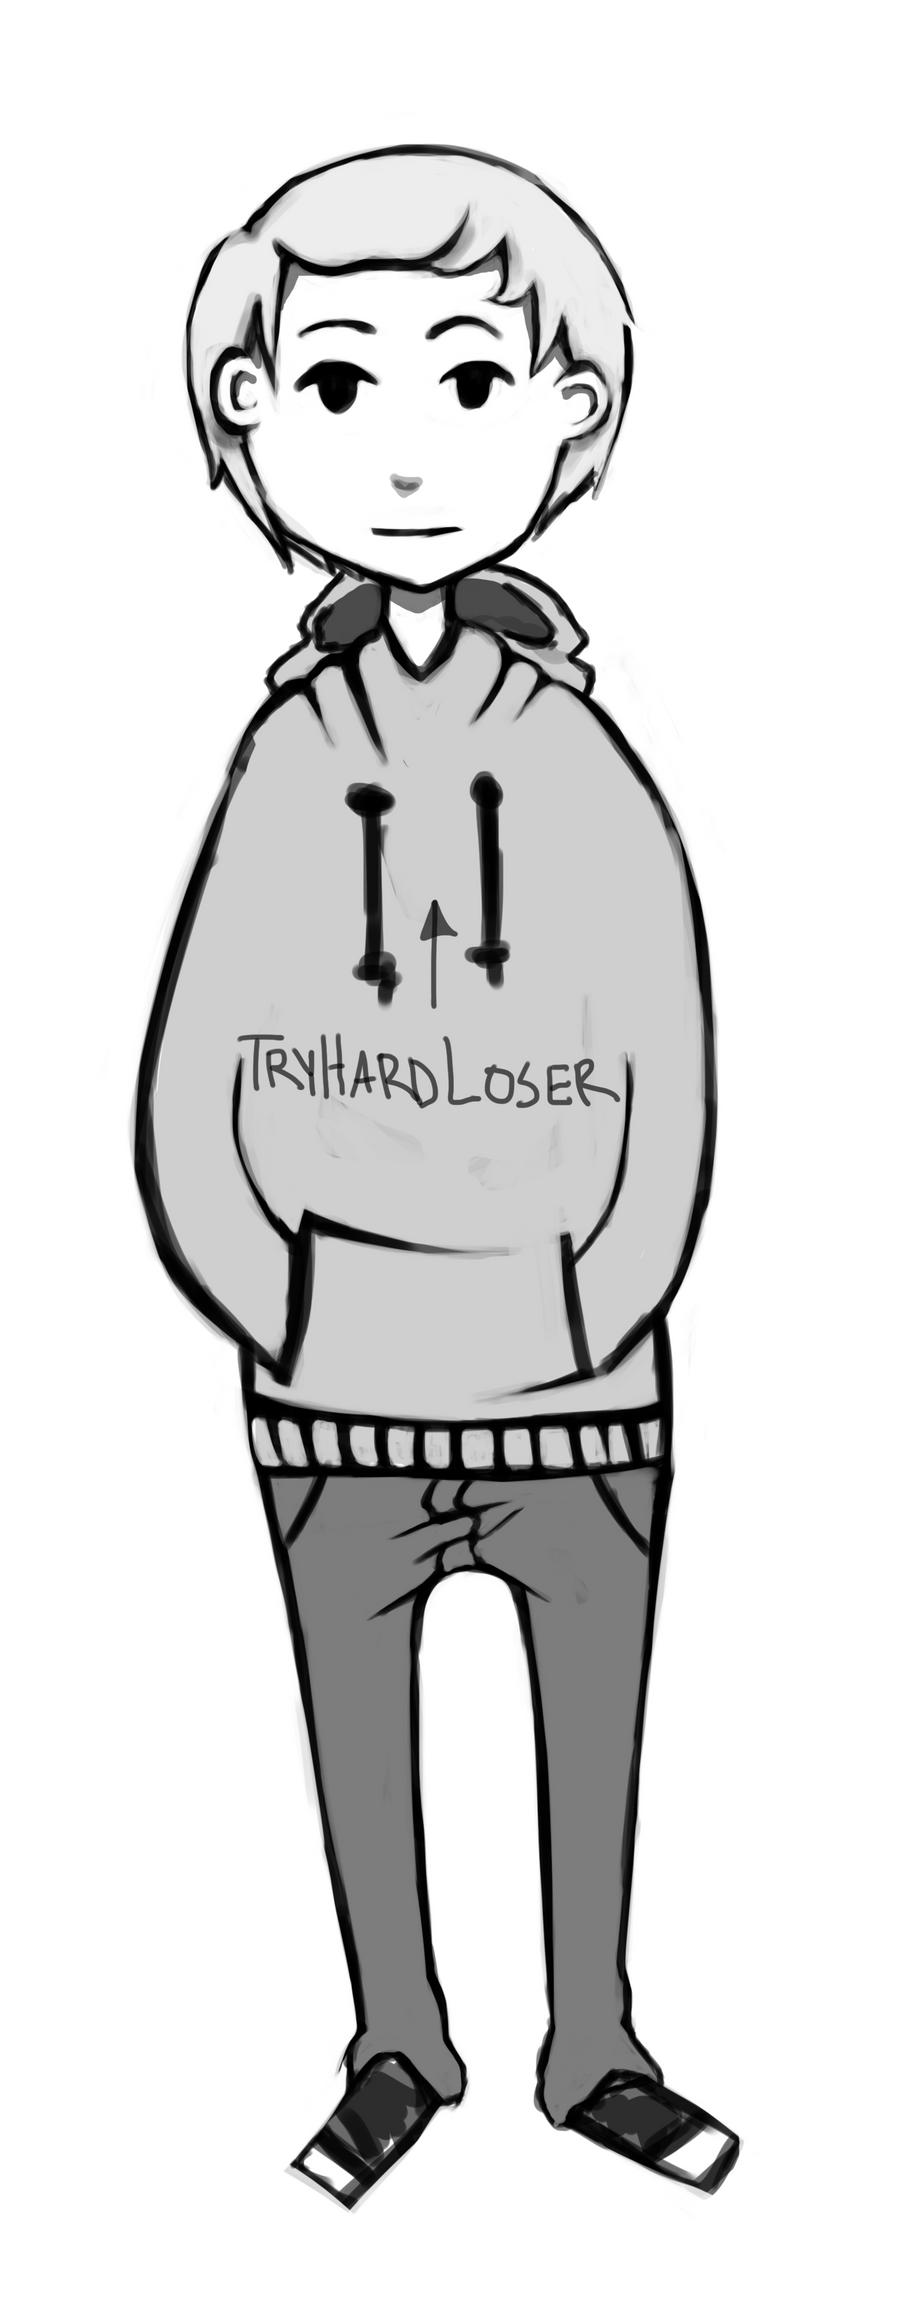 tryhardloser's Profile Picture